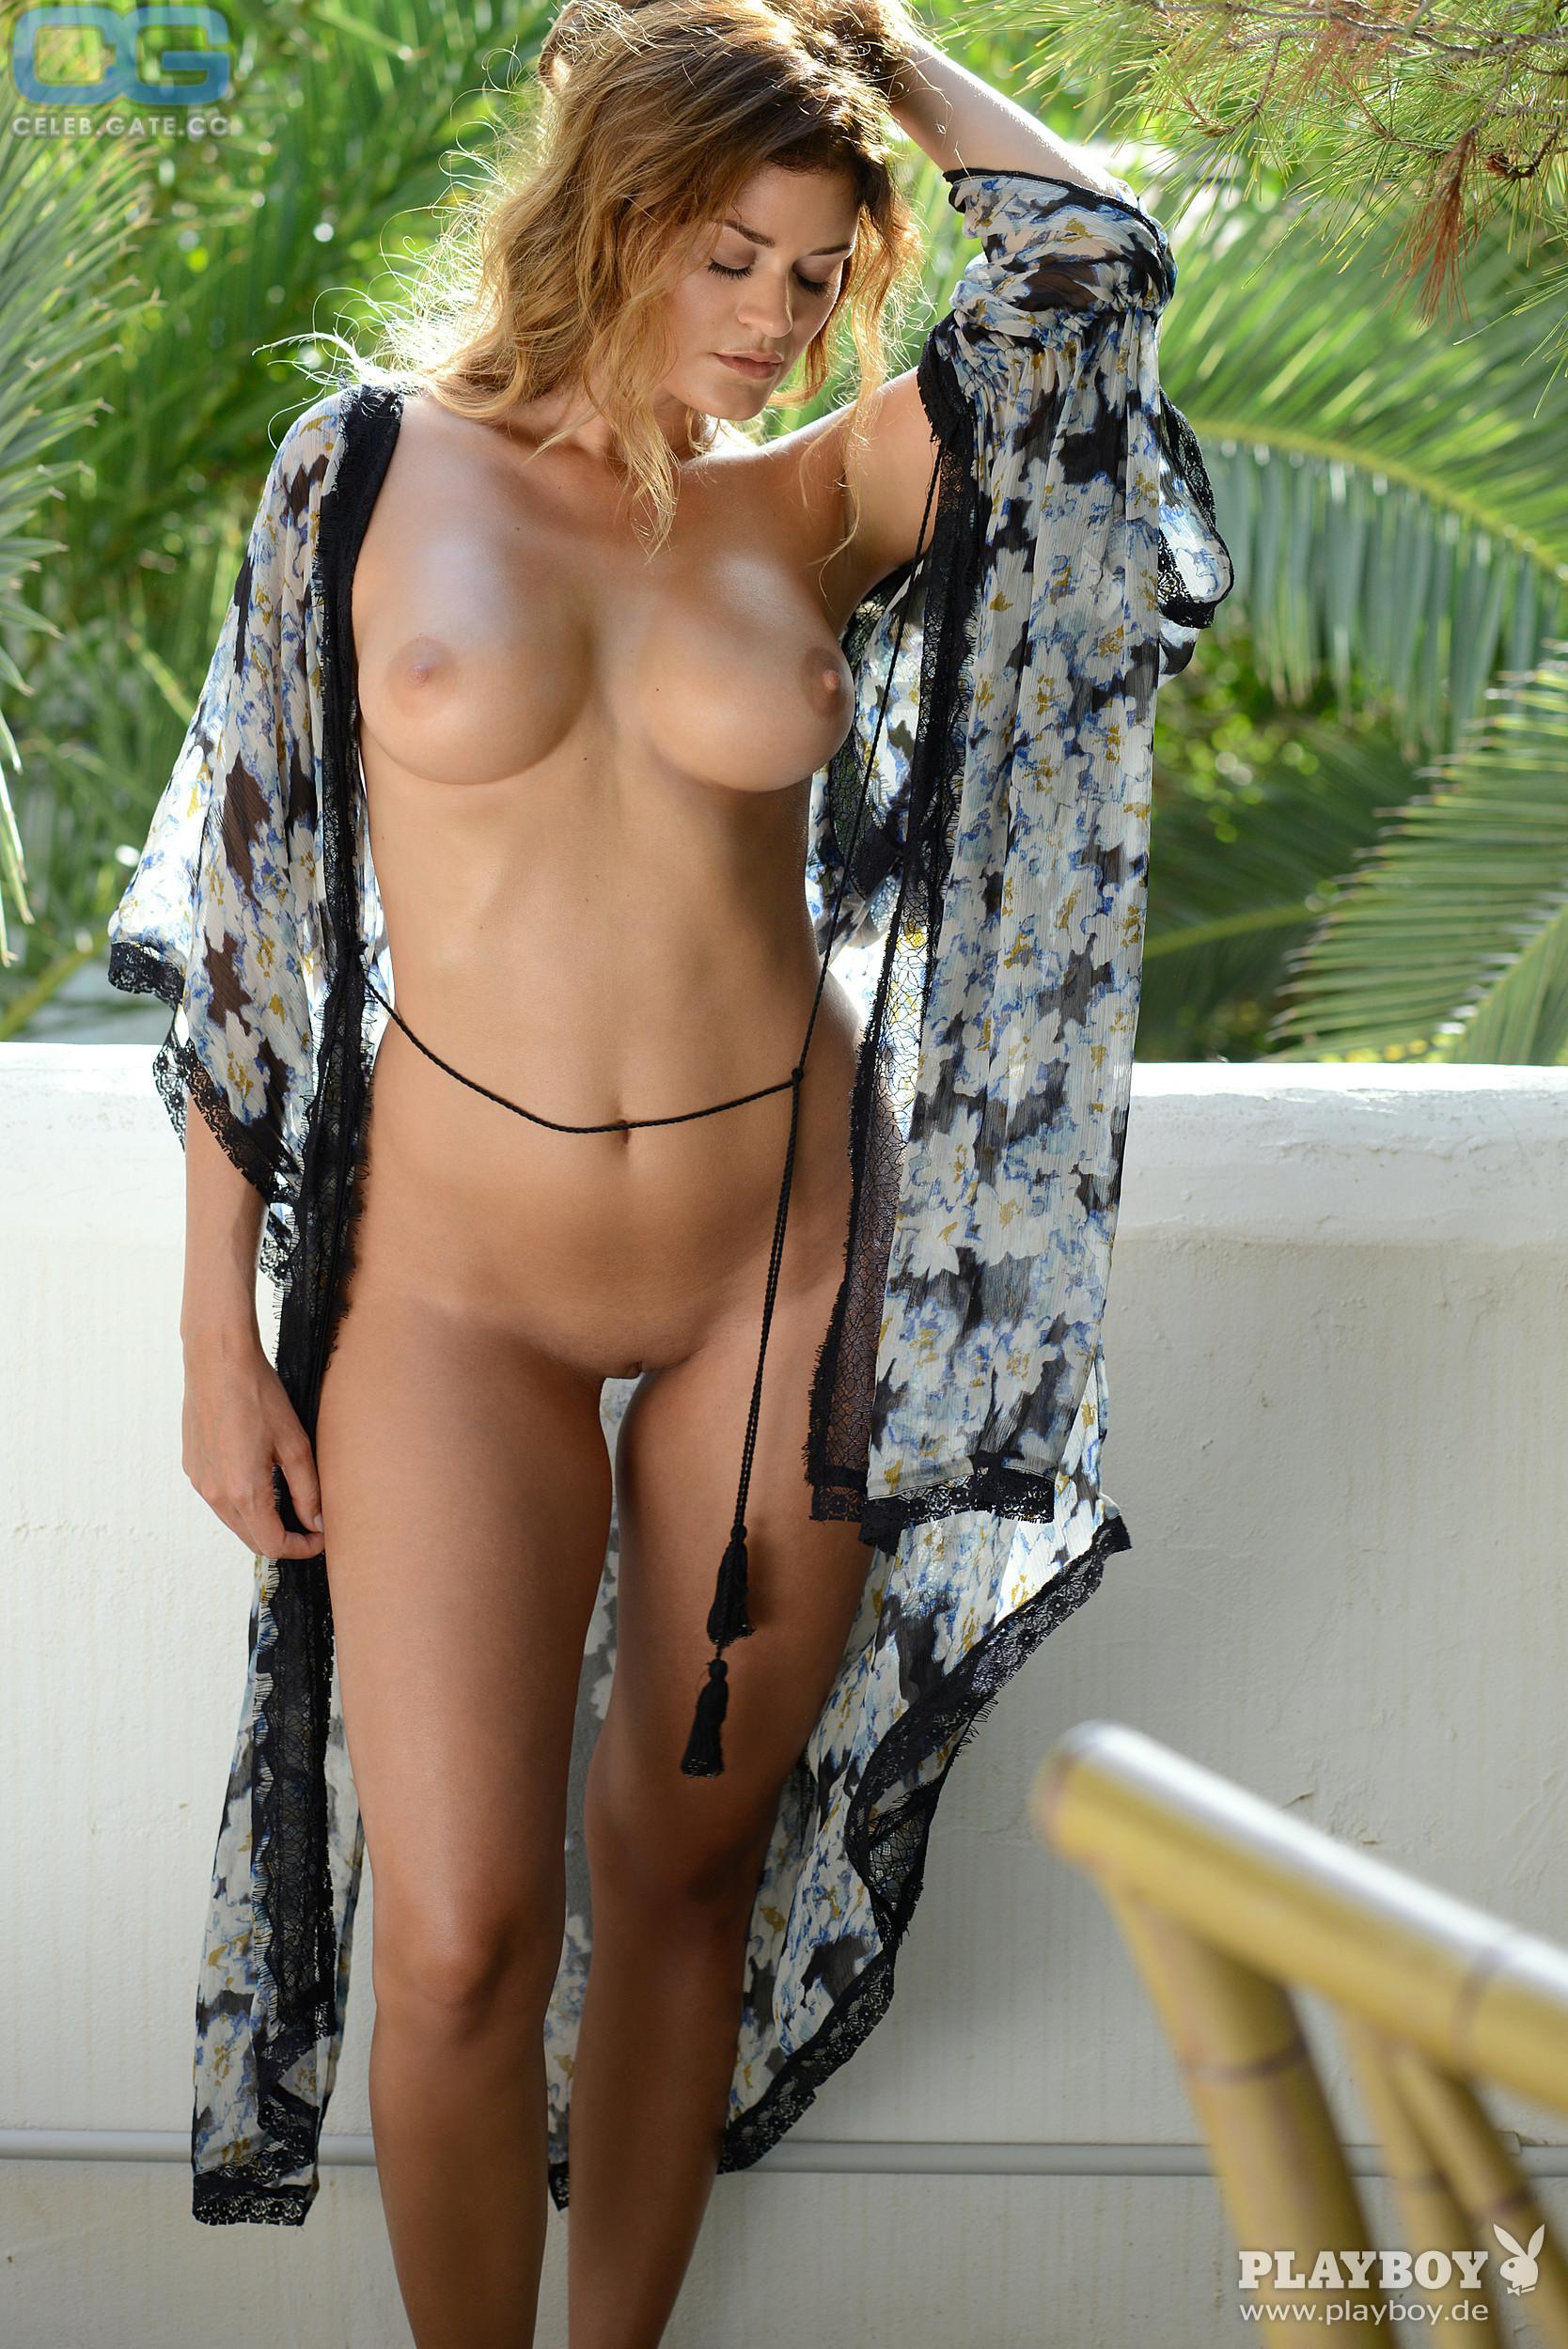 Braun nackt playboy christina Christina Braun